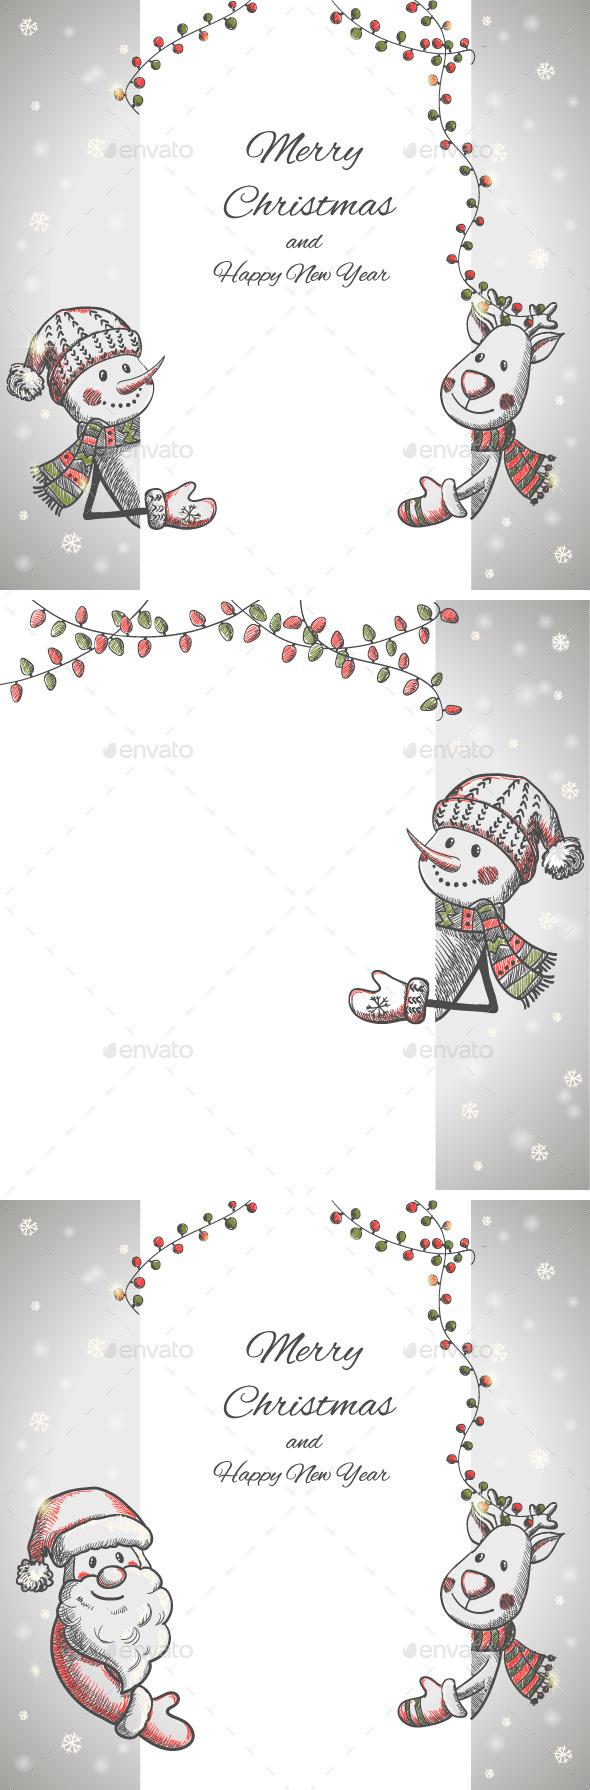 GraphicRiver Set of Three Hand Drawn Christmas Cards 9774647